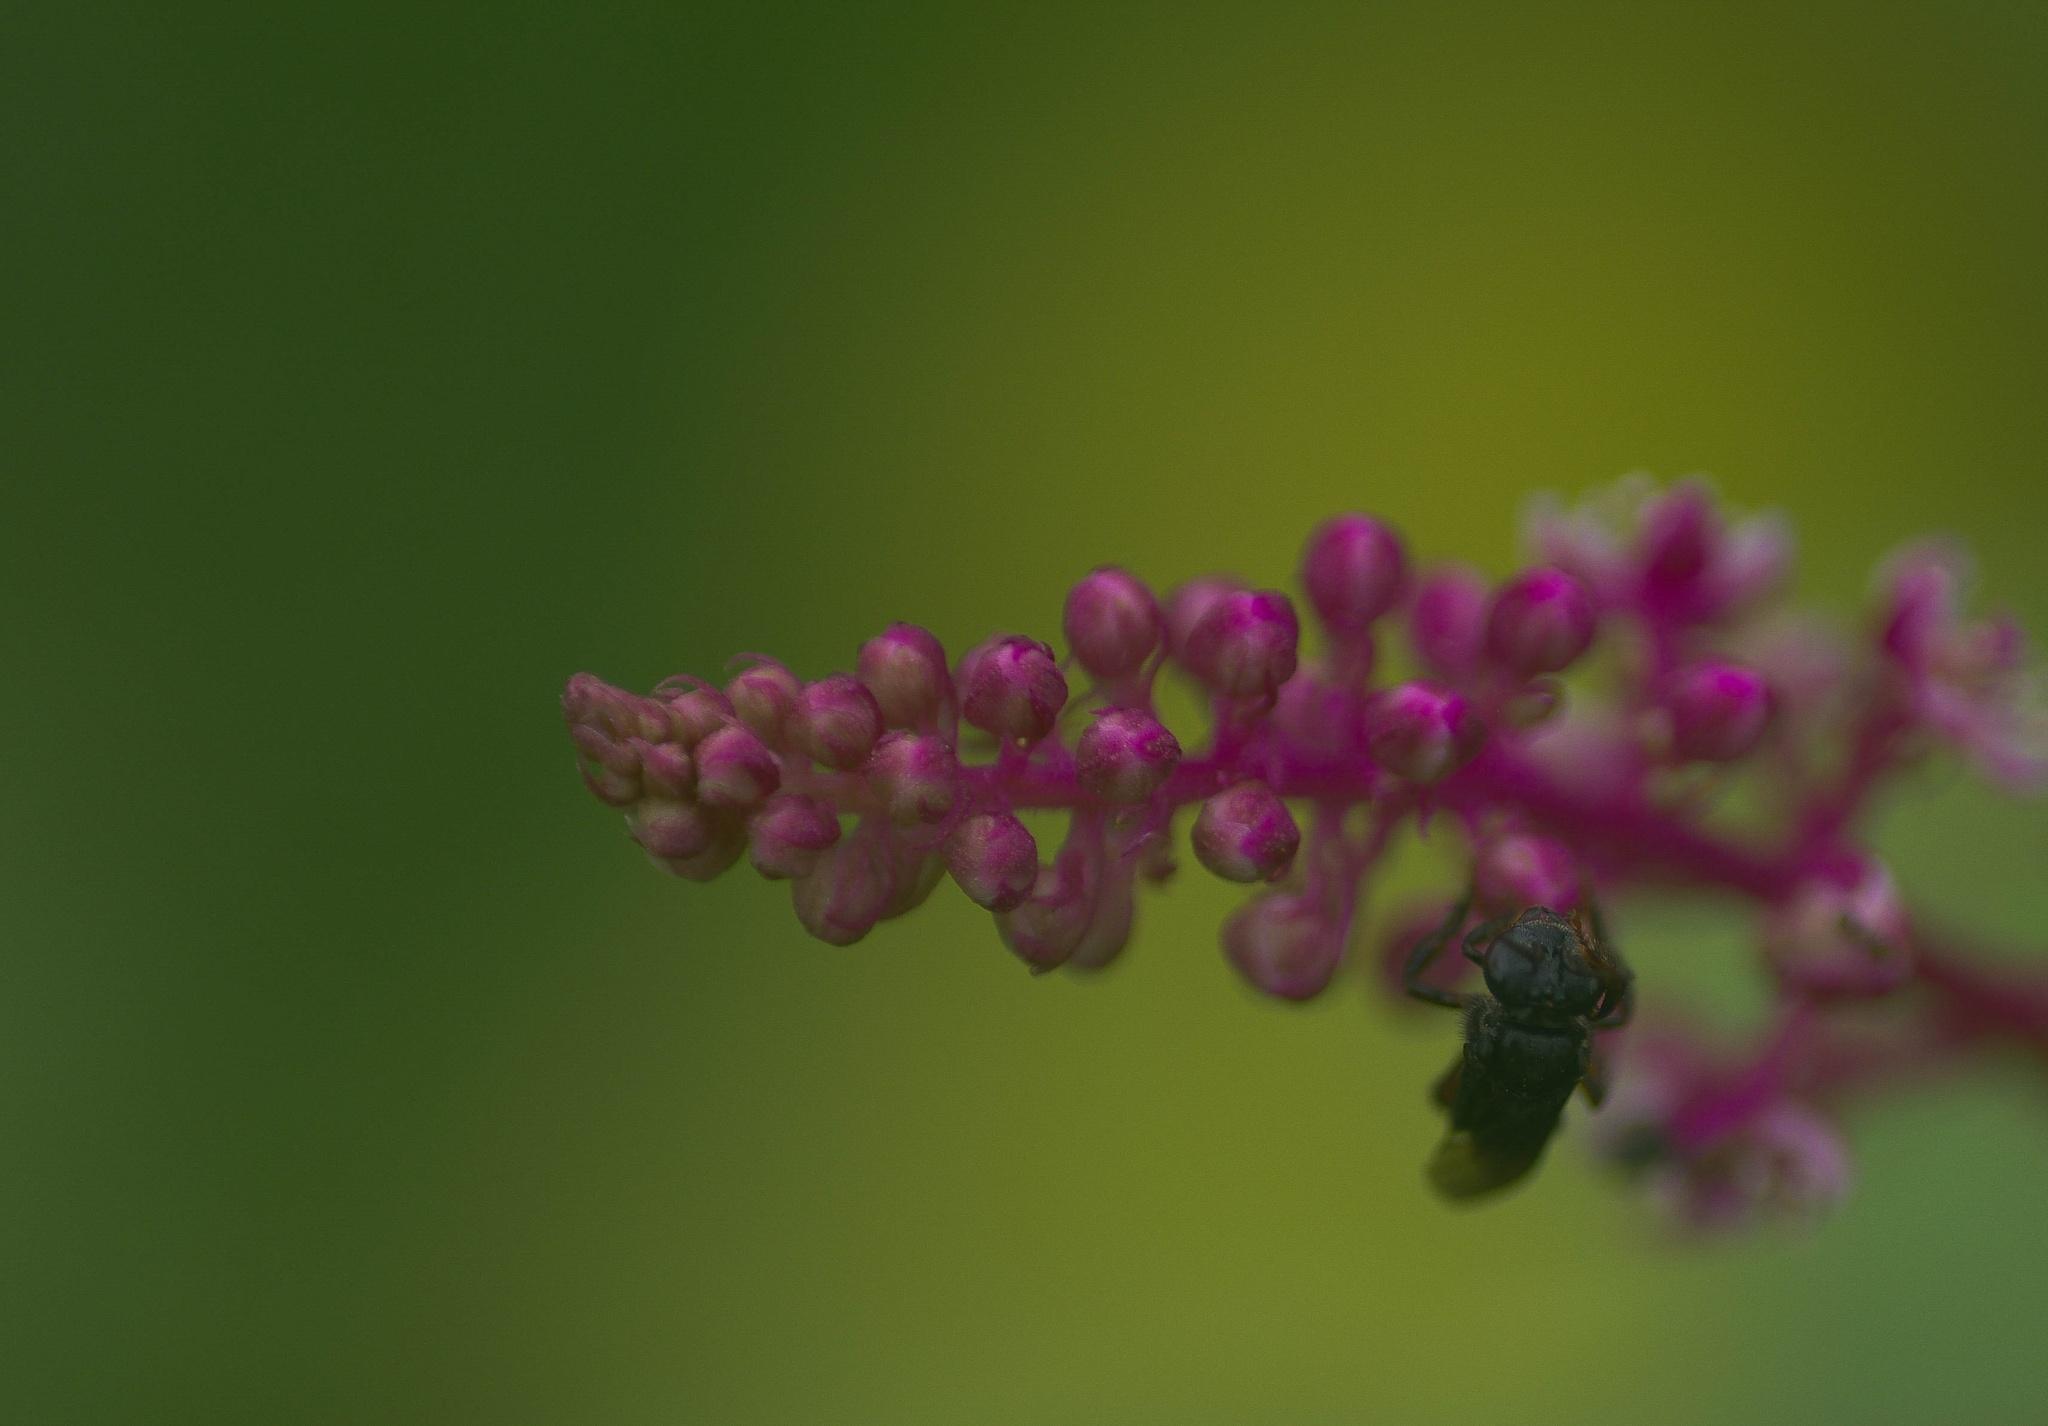 A bug in my flower by Fernanda Caleffi Barbetta